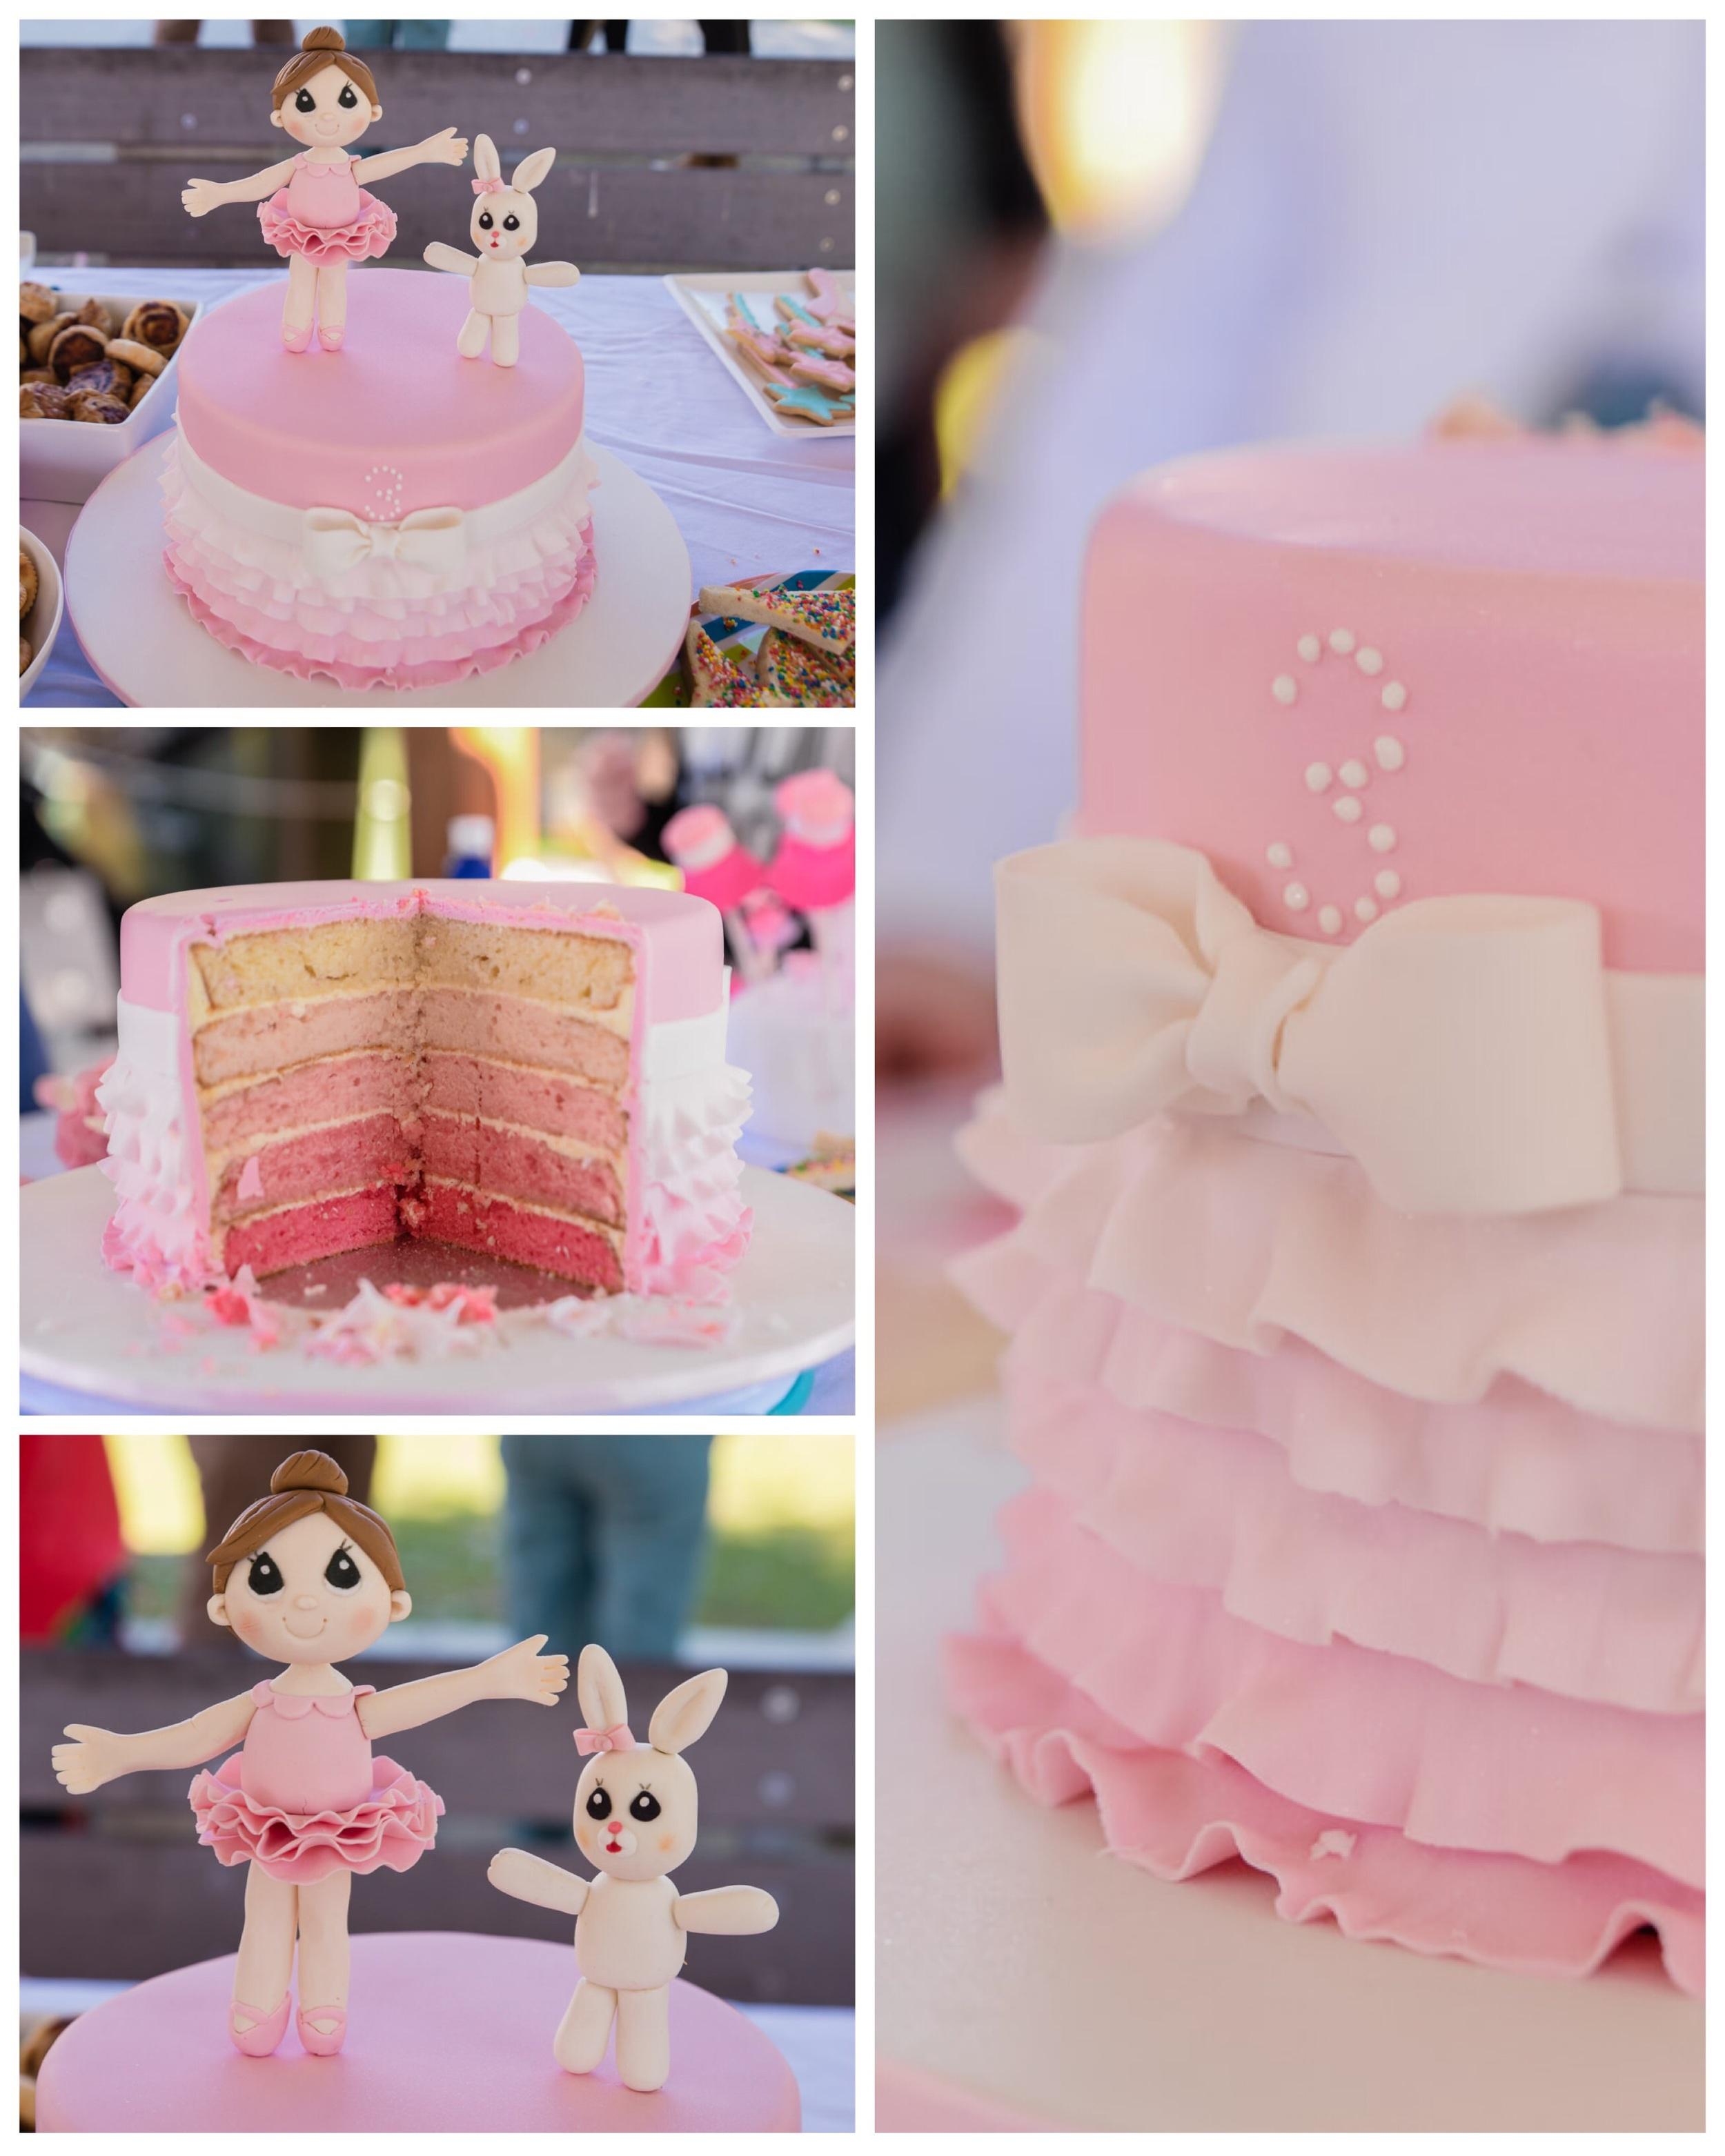 The amazing birthday cake made by the birthday girl's talented mum